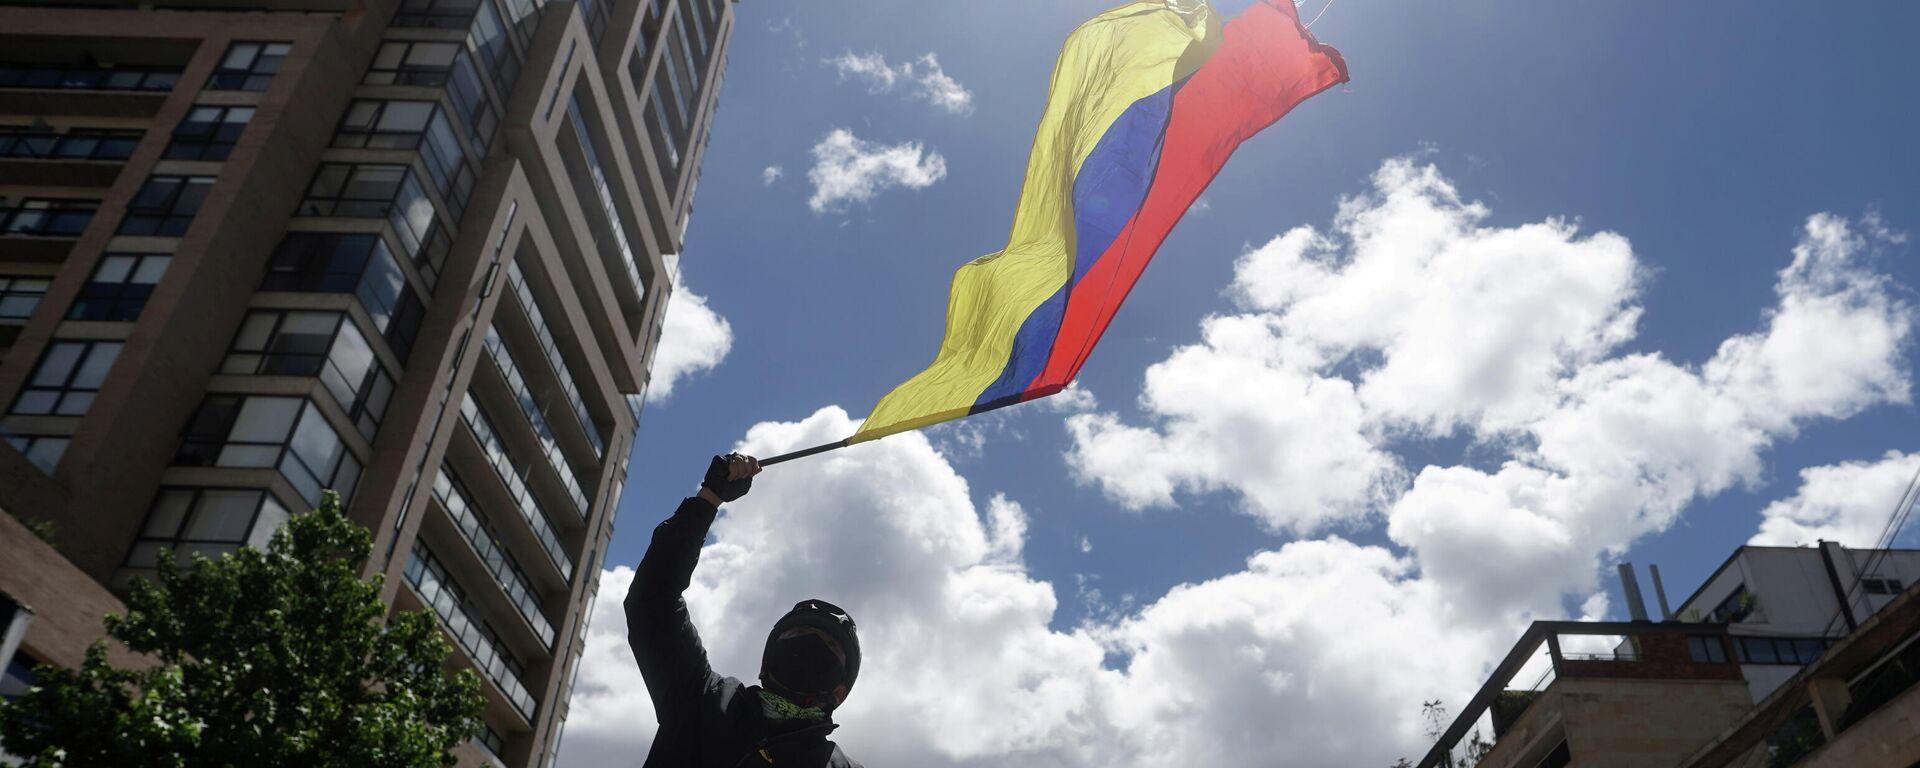 Manifestación en Bogotá, Colombia - Sputnik Mundo, 1920, 03.06.2021